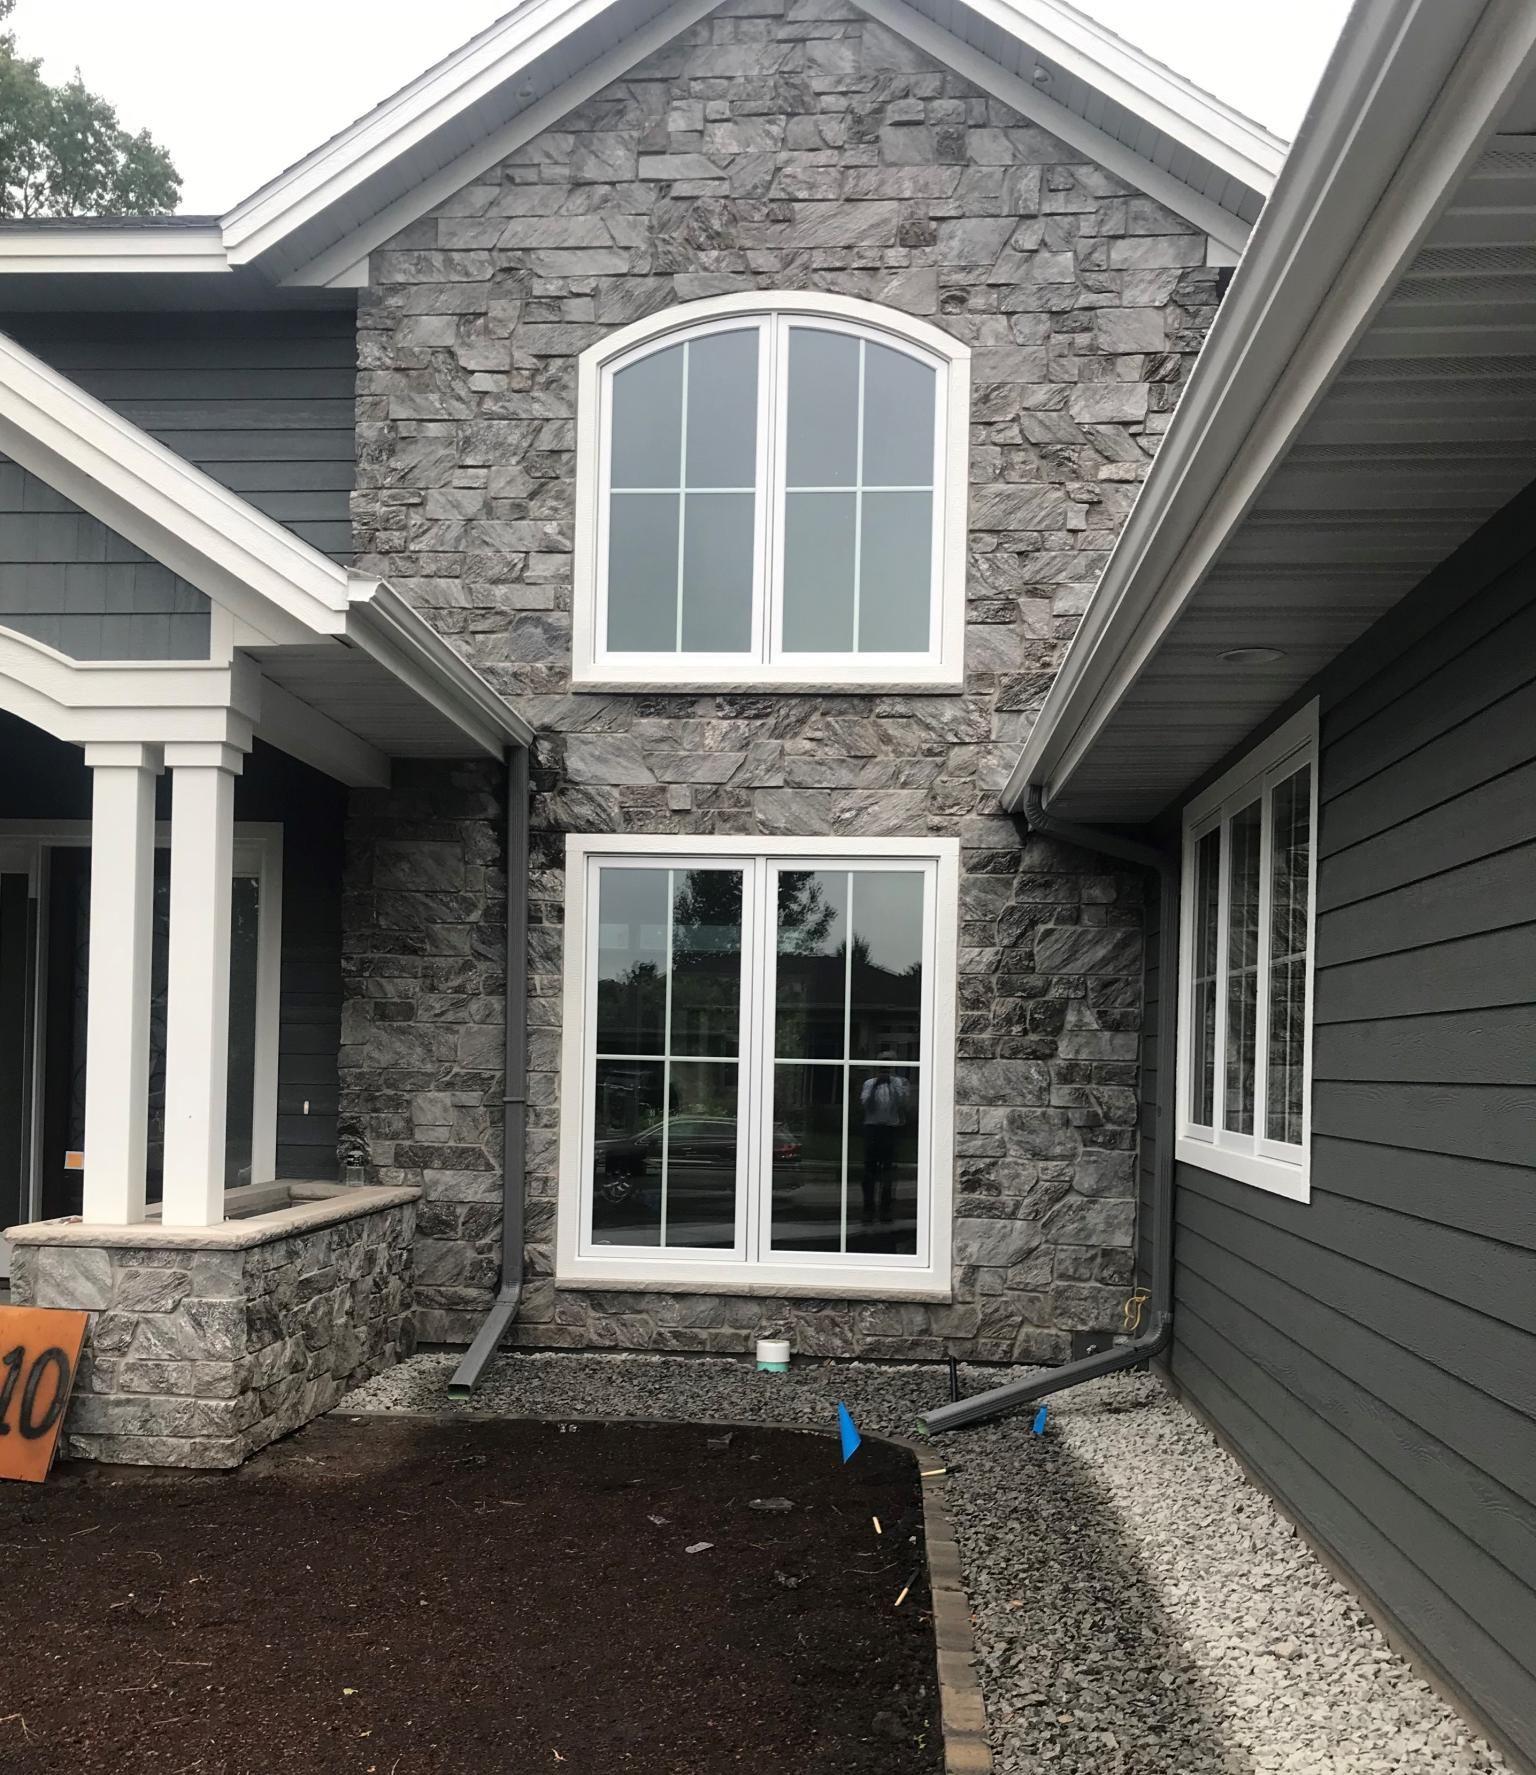 Moonlight Natural Thin Stone Veneer Quarry Mill Stone Accent Walls Natural Stone Veneer Stone Veneer Exterior